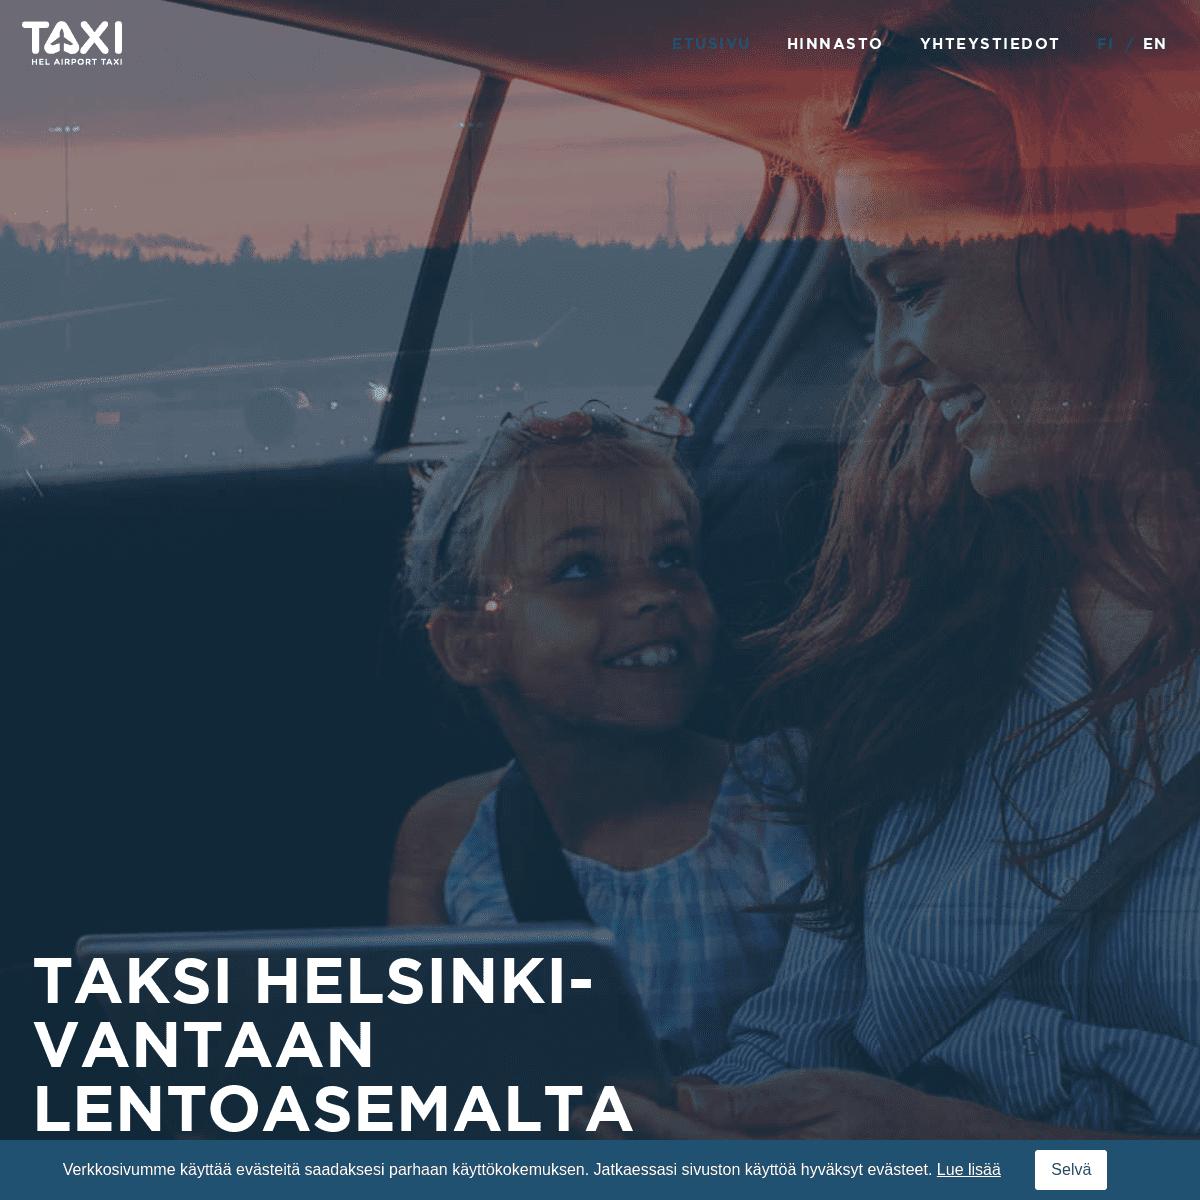 ArchiveBay.com - helsinkiairporttaxi.fi - Etusivu - Helsinki Airport Taxi